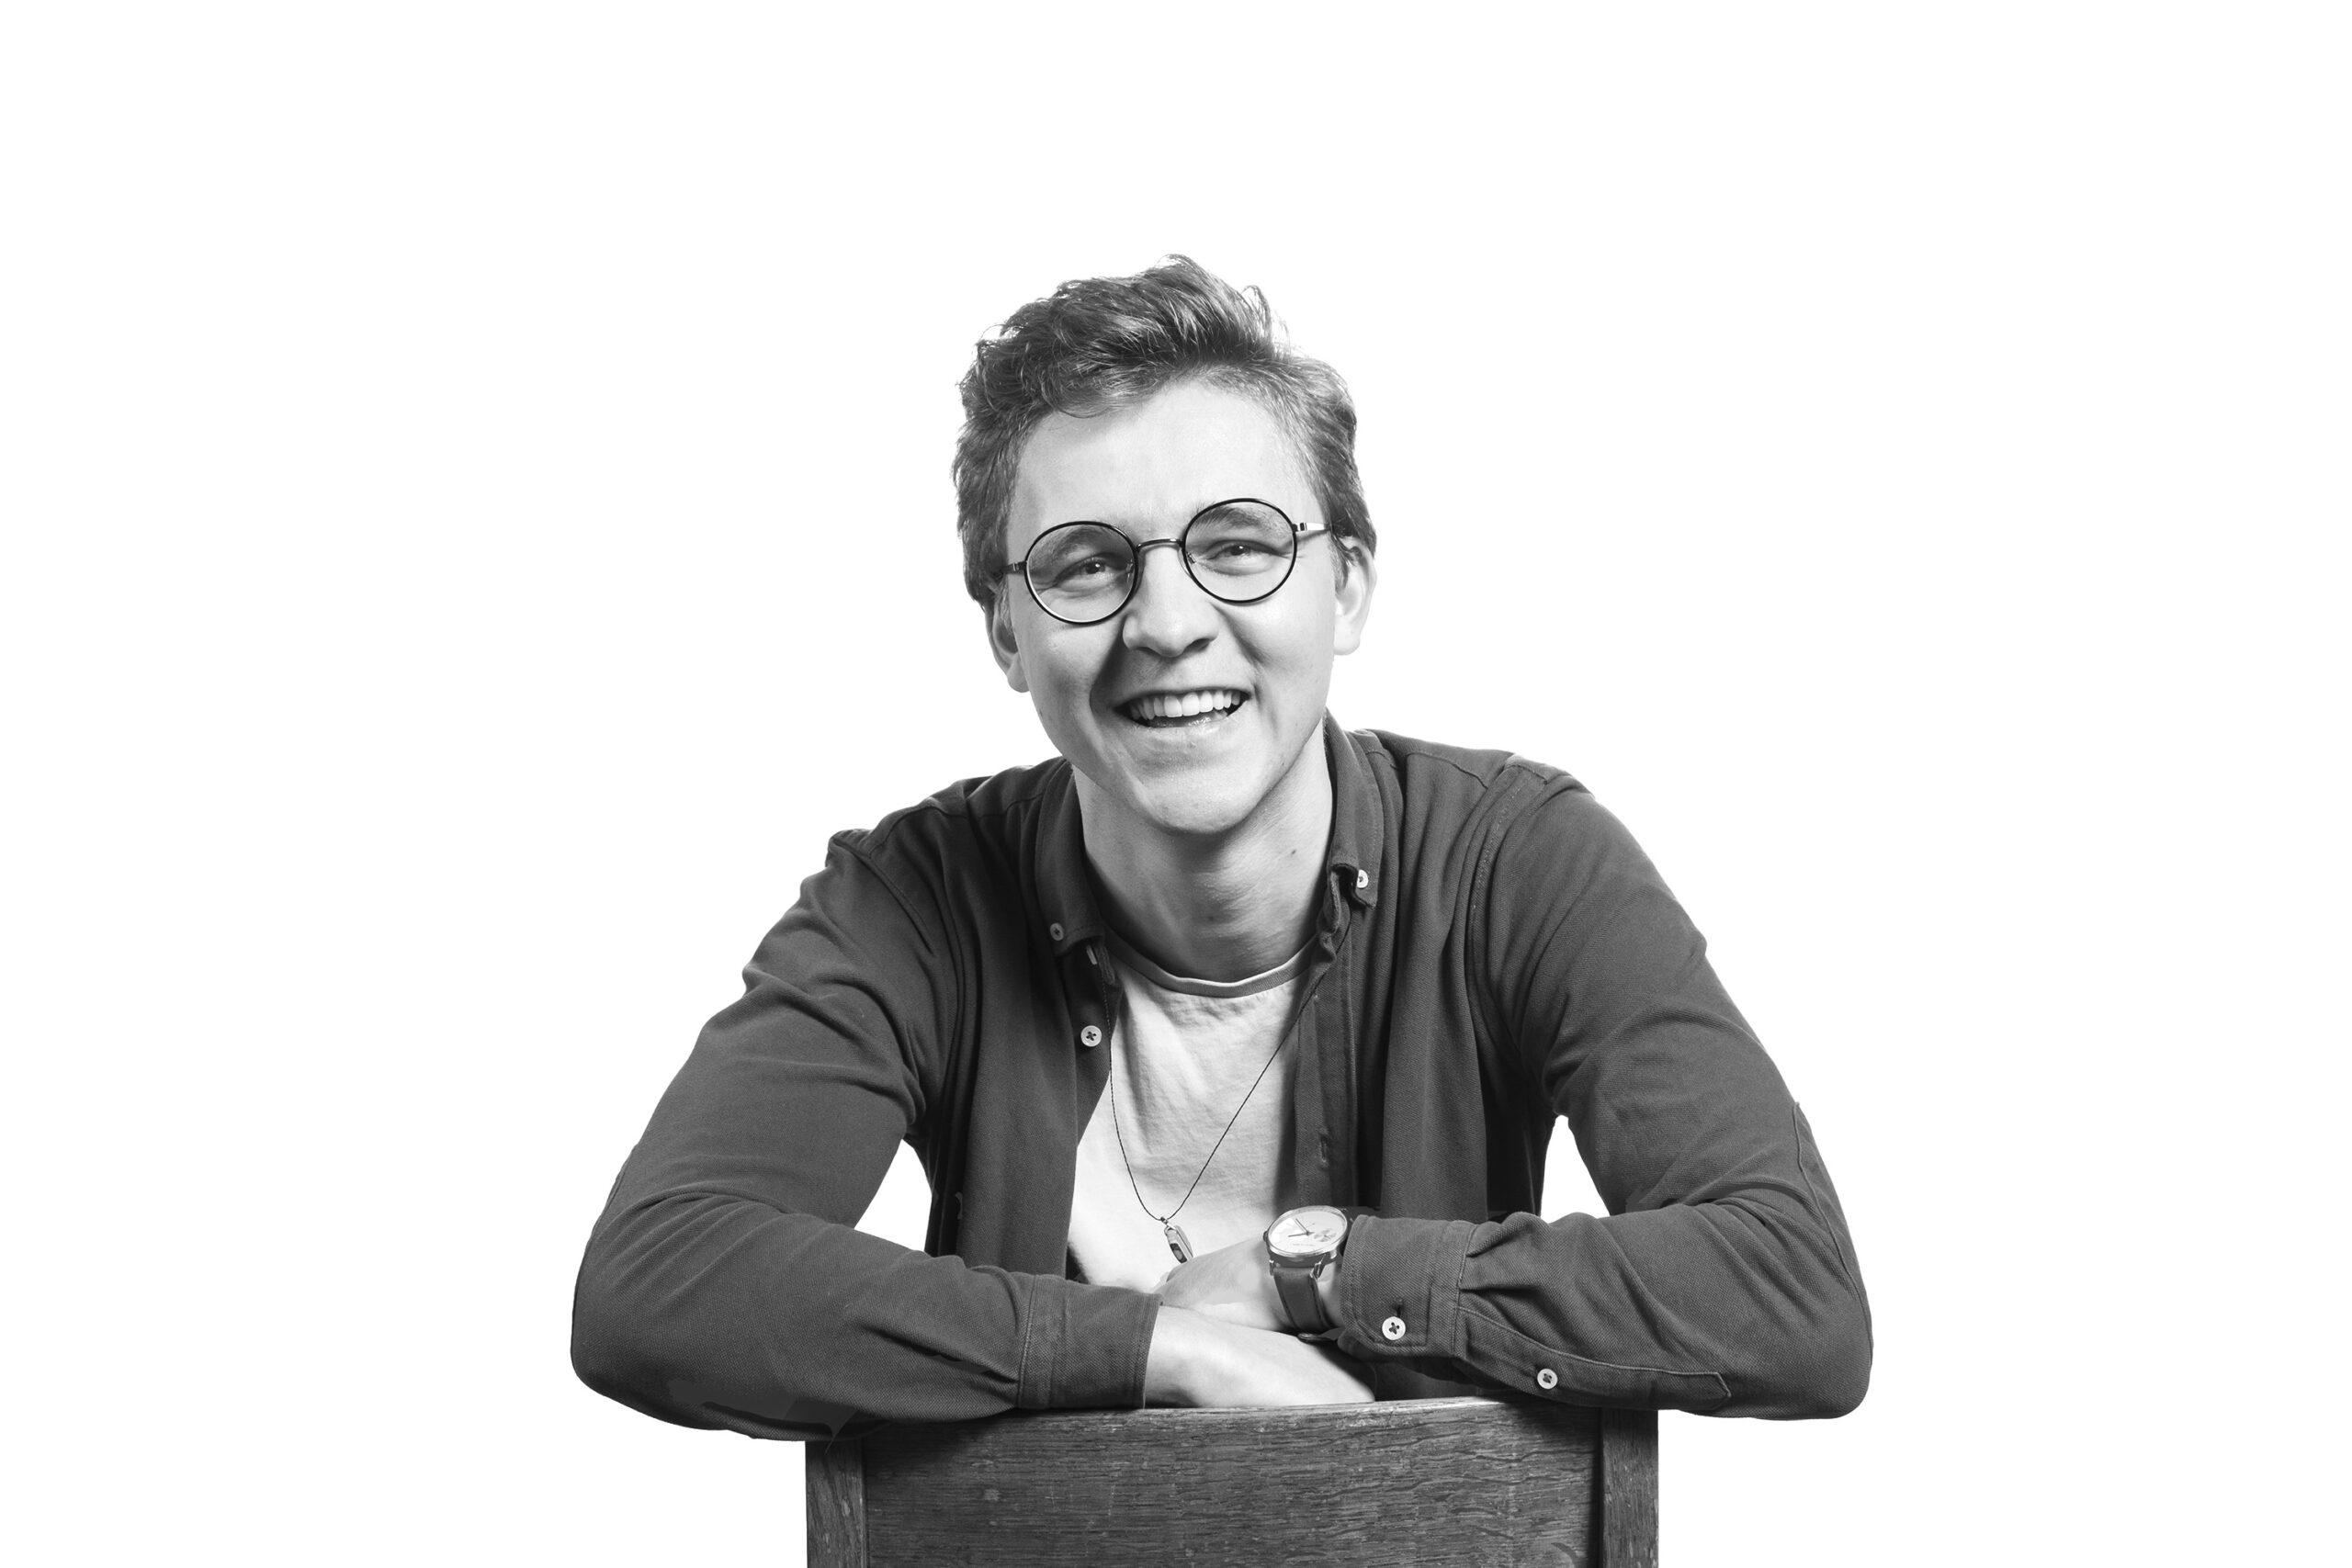 Oscar Delissen